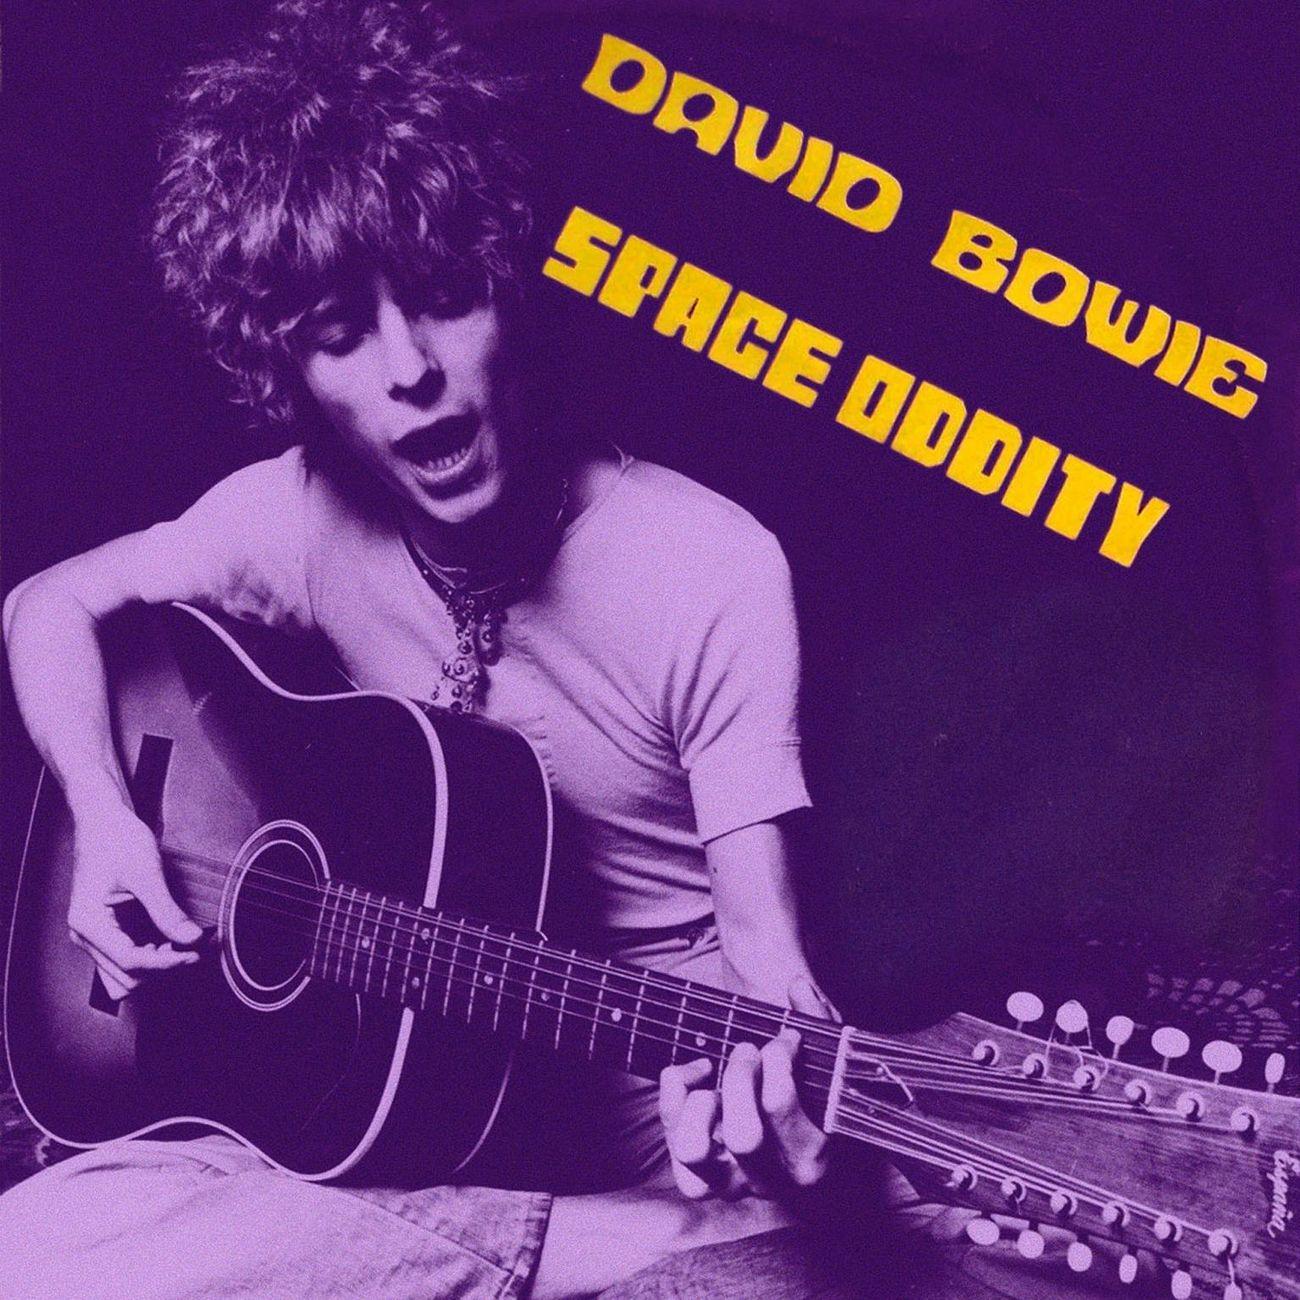 Space oddity (40th anniversary EP)